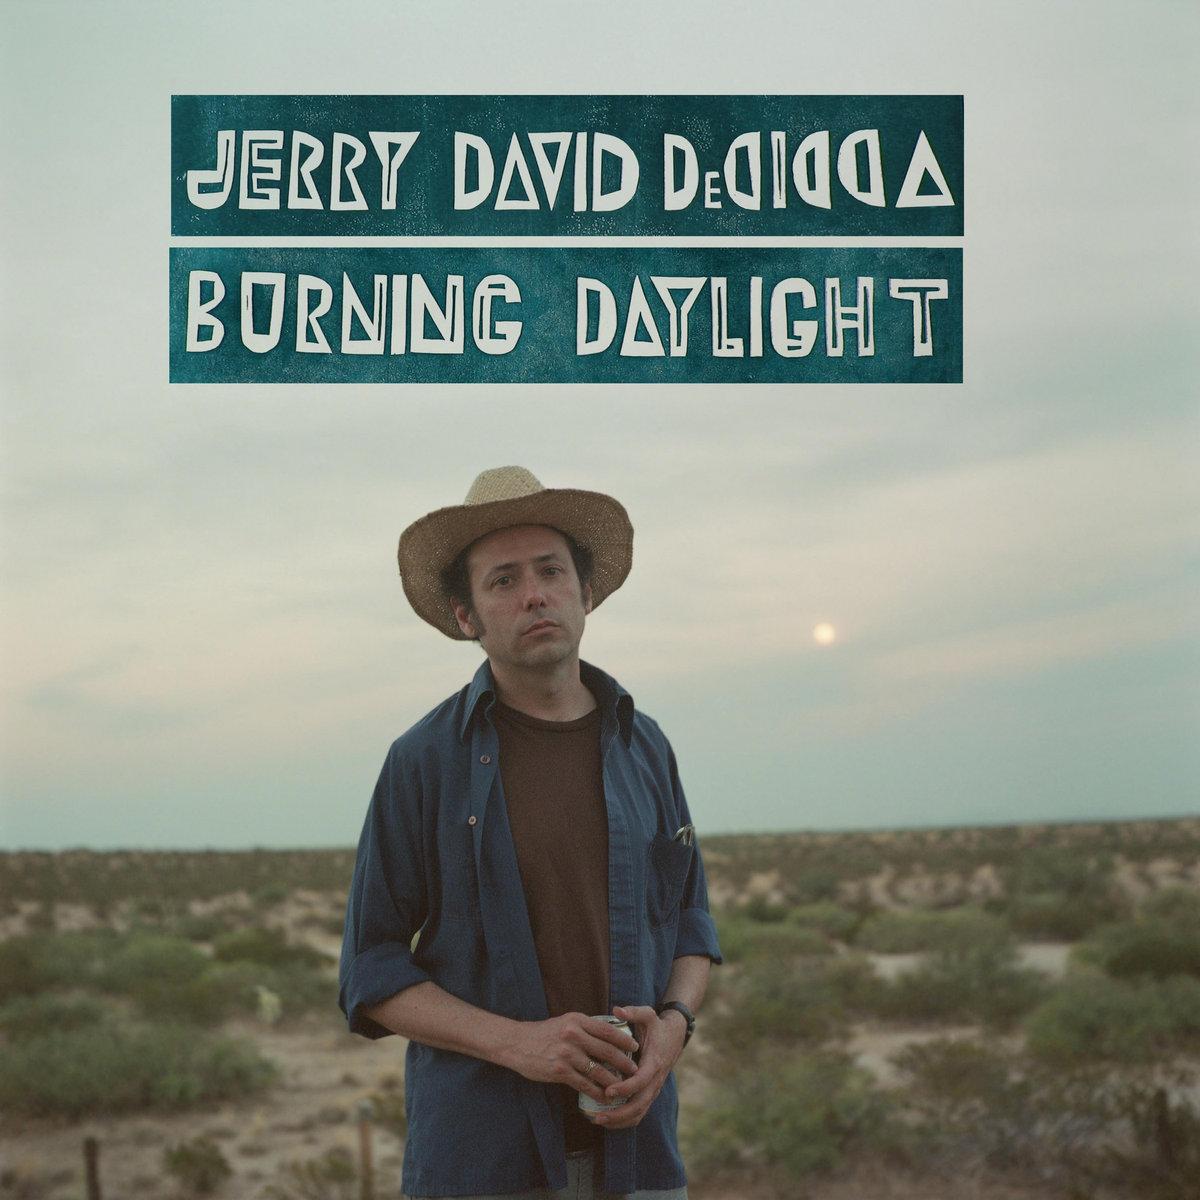 Jerry david